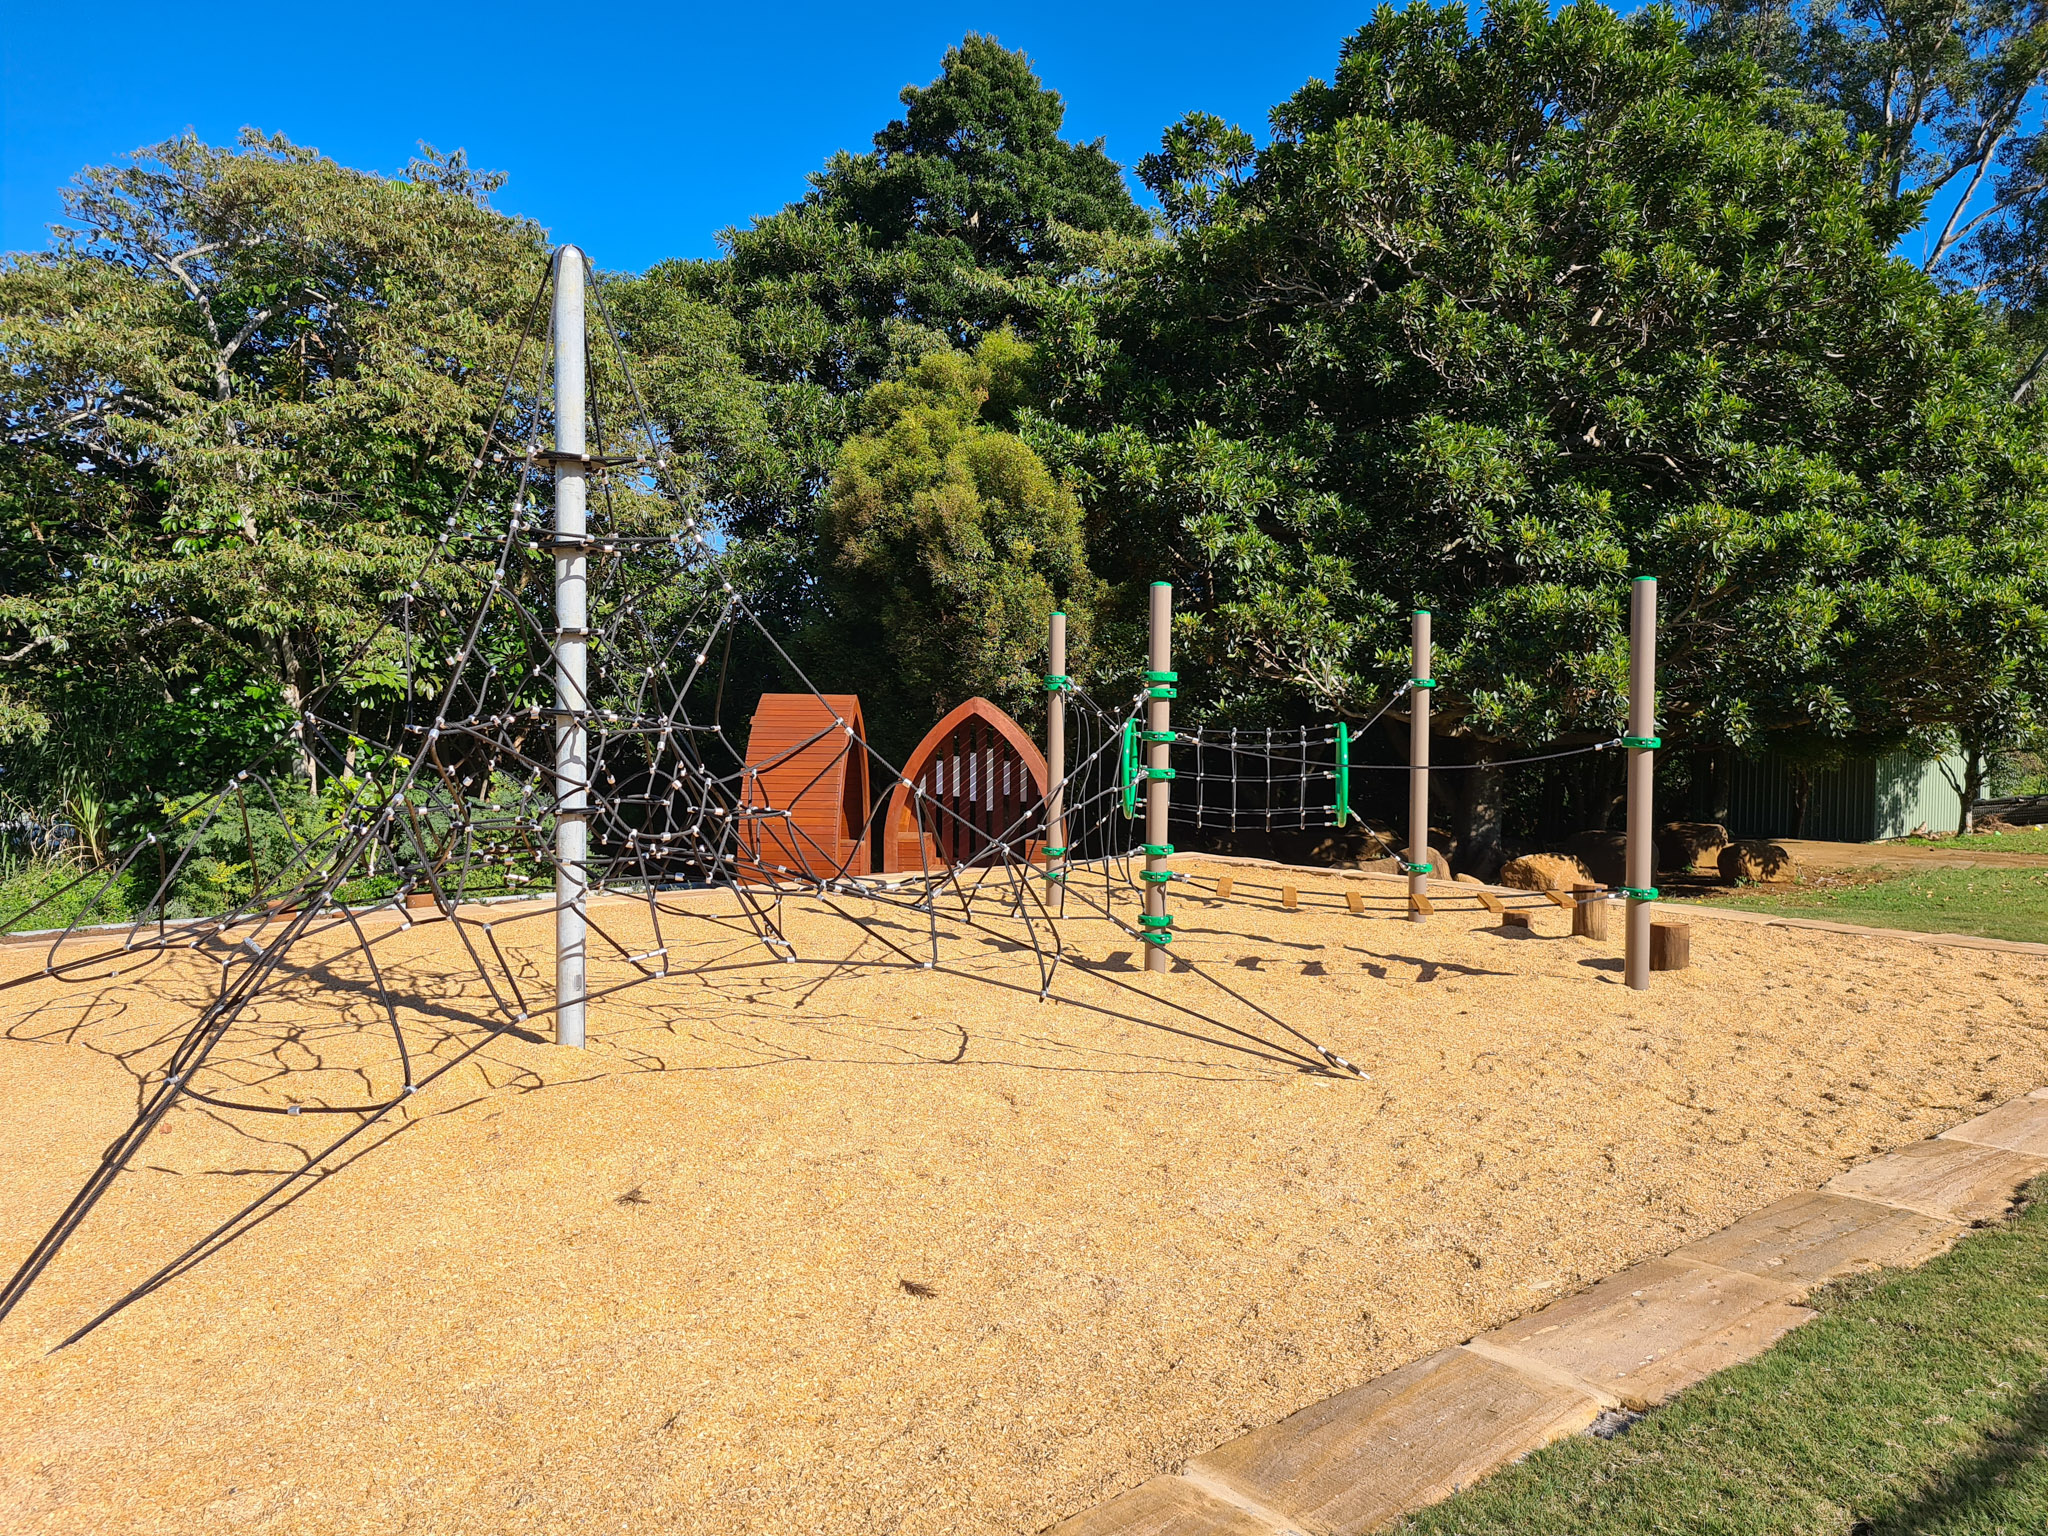 palm-beach-state-school-playrground-austek-play-21